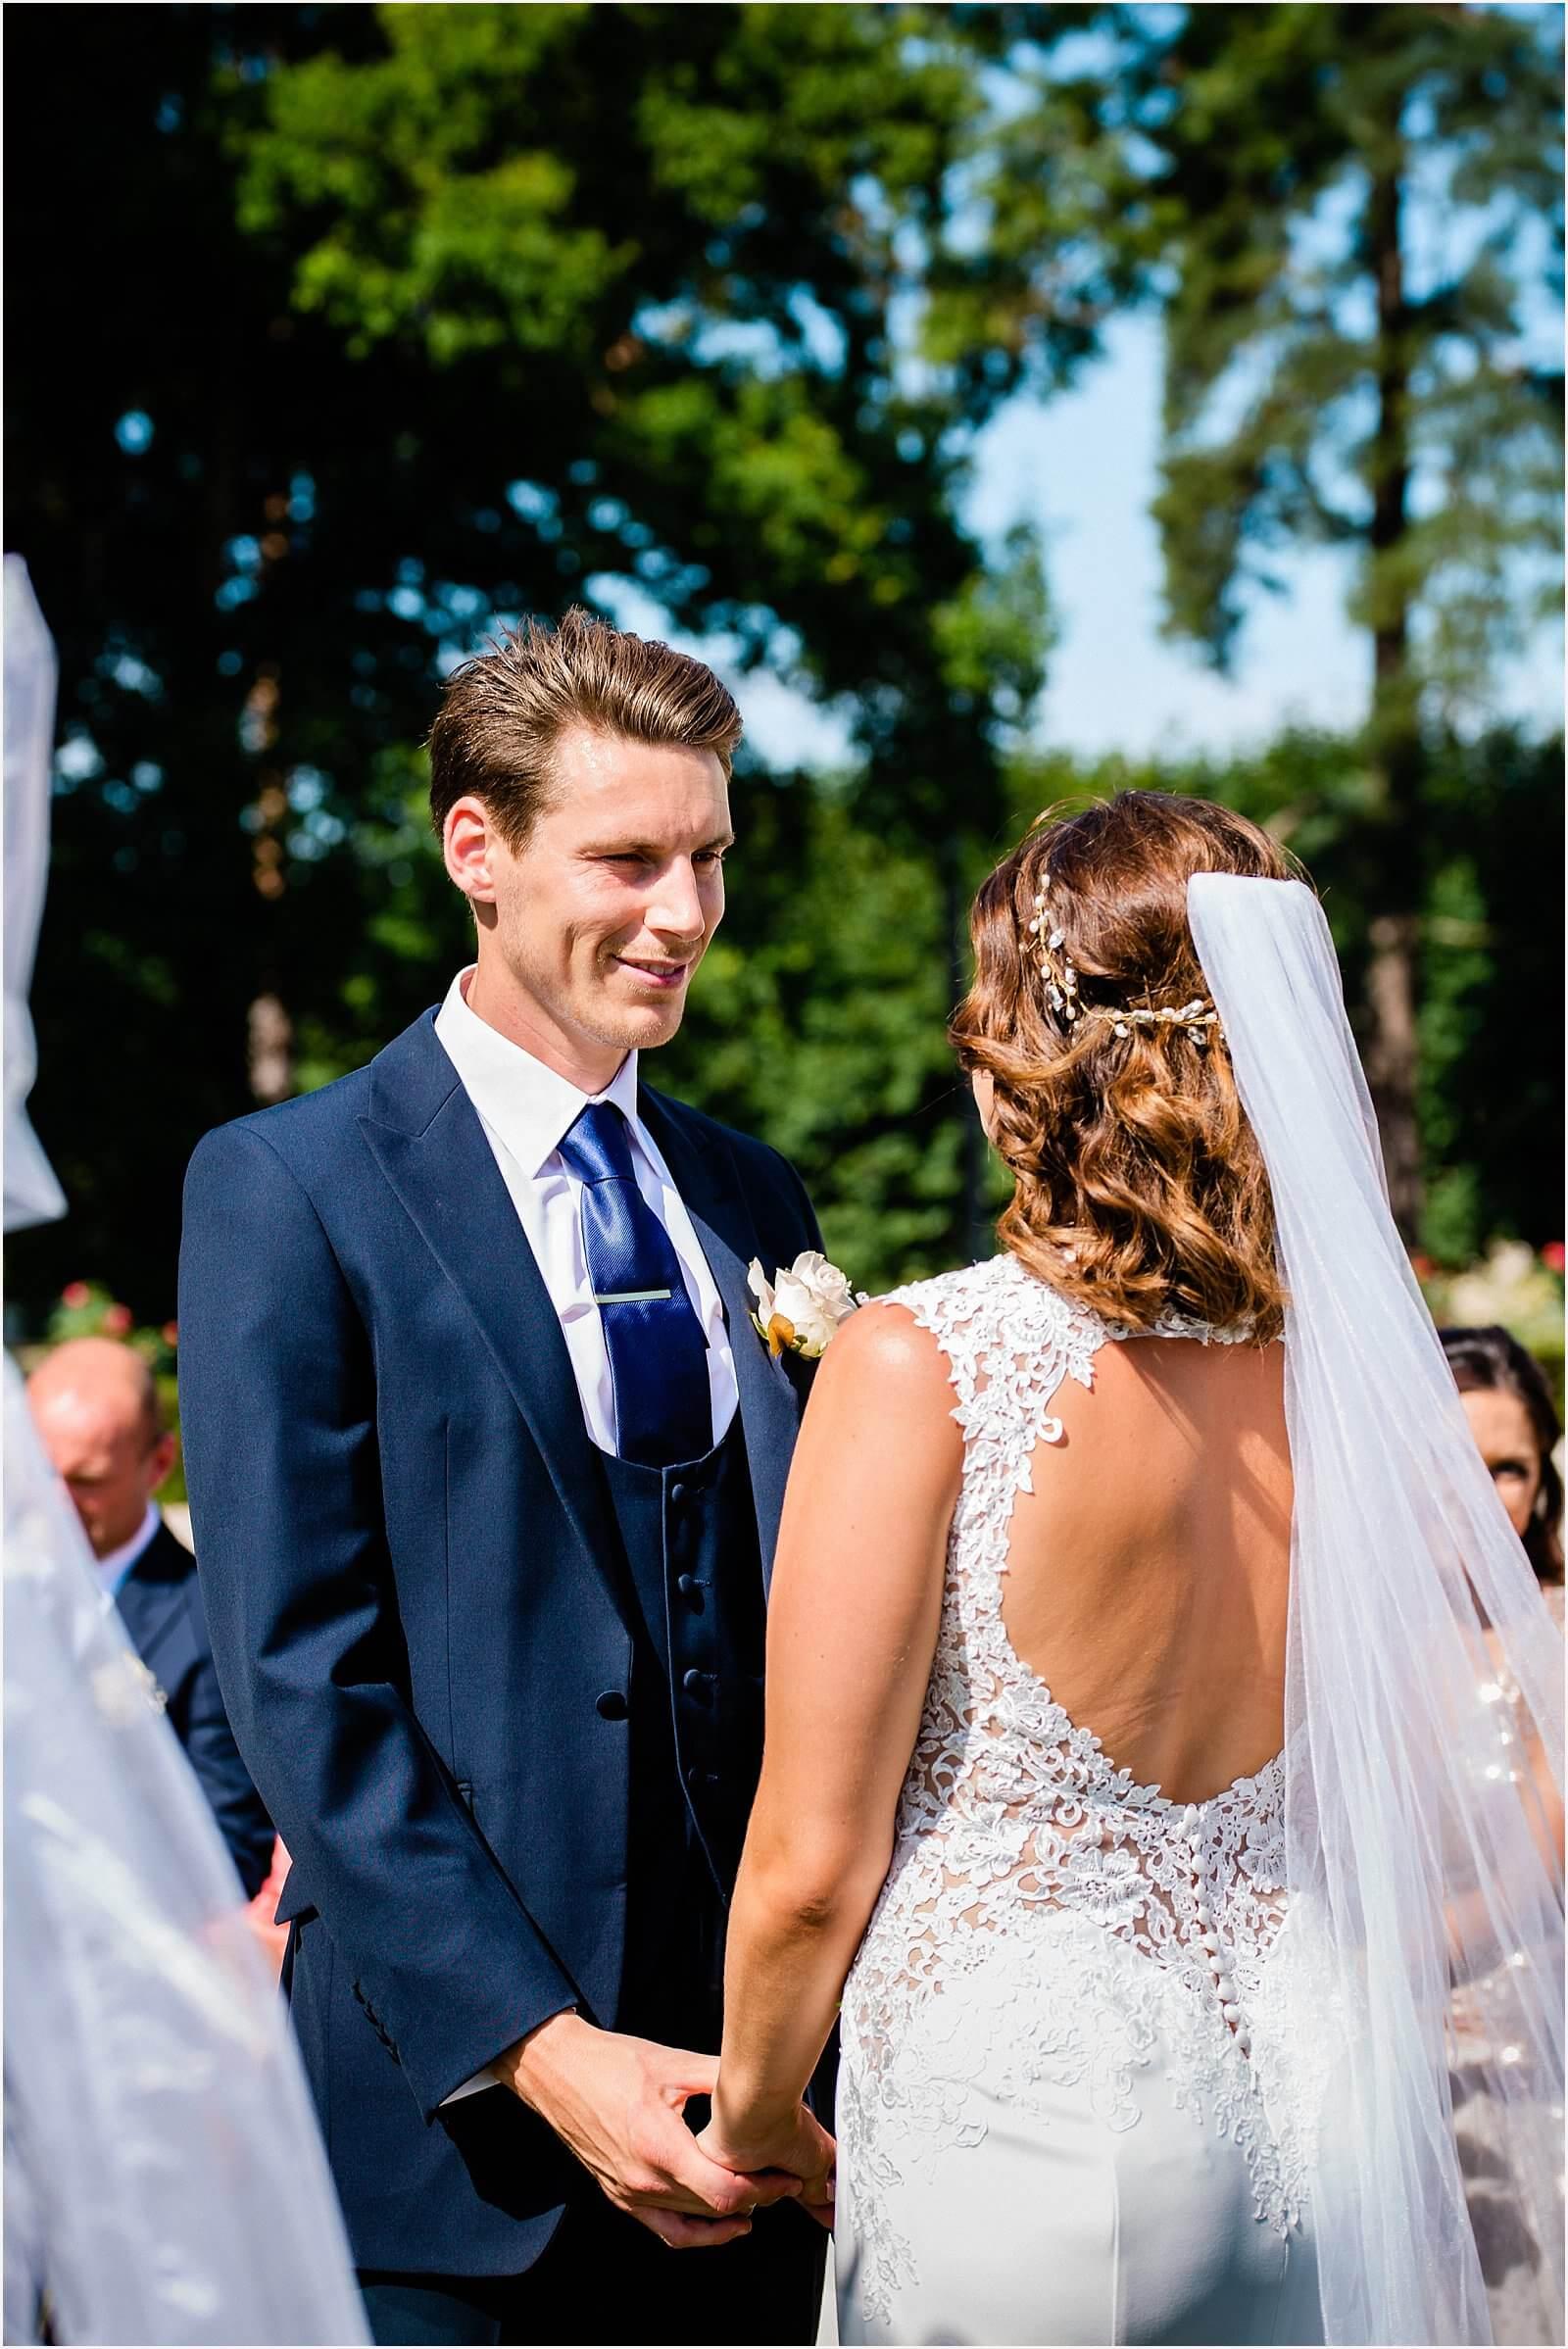 Chateau de Courtomer Wedding | Chantel & Evan 29